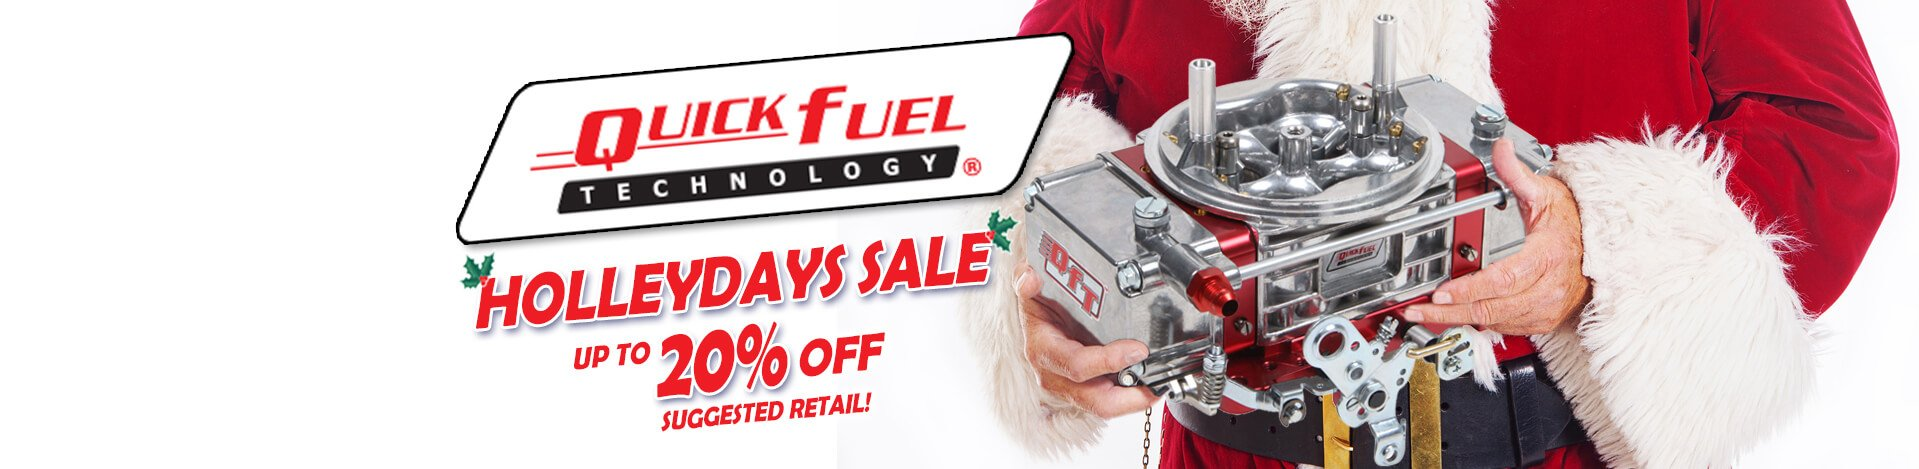 Quick Fuel Technology Carburetors And Carburetor Parts For Drag Hot Rod Wiring Kits Racing Street Rods